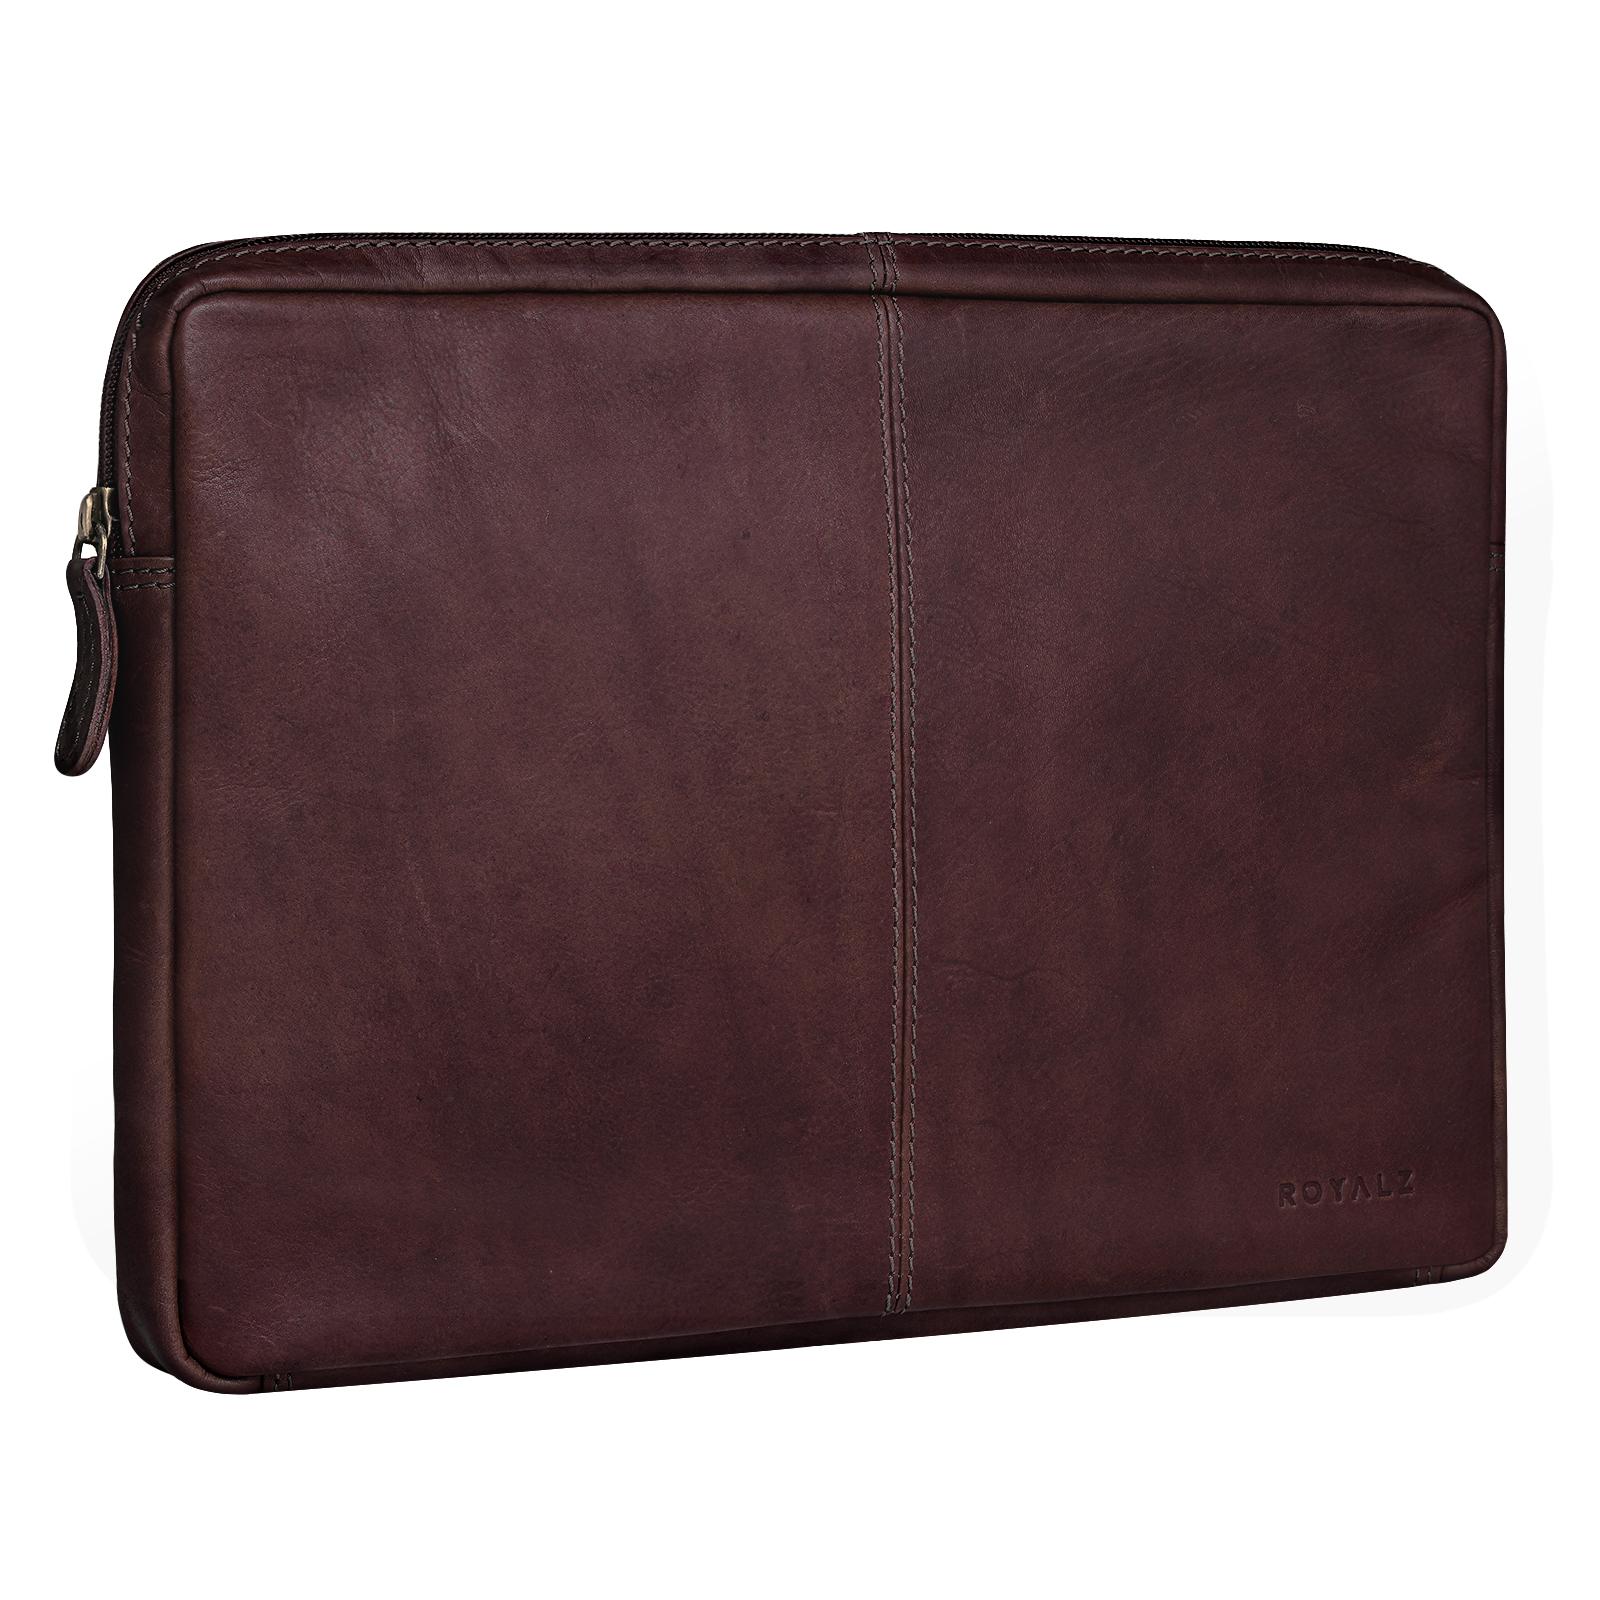 ROYALZ Ledertasche für Microsoft Surface Pro 6 Tasche Leder Hülle 12,3 Zoll Vintage Lederhülle Schutzhülle Sleeve Etui Retro